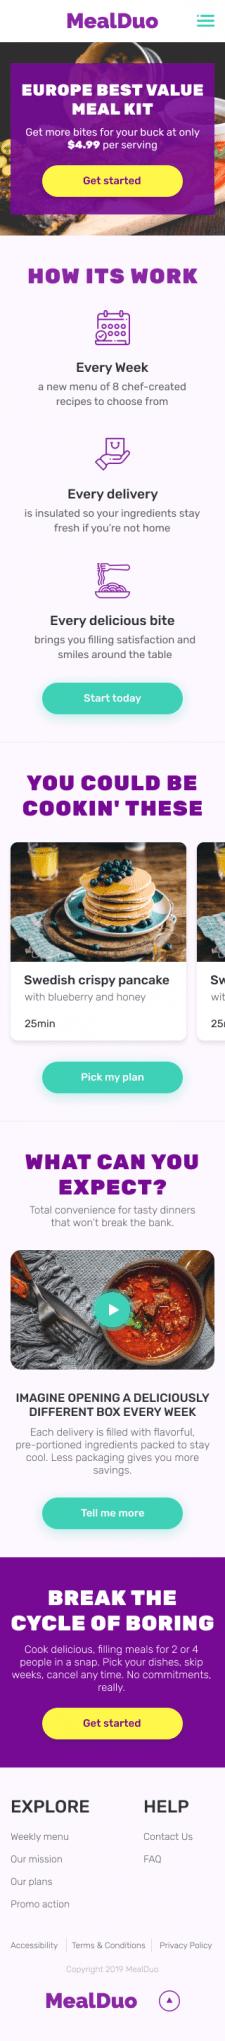 MealDuo - Subscription Fresh Food (Adaptive)